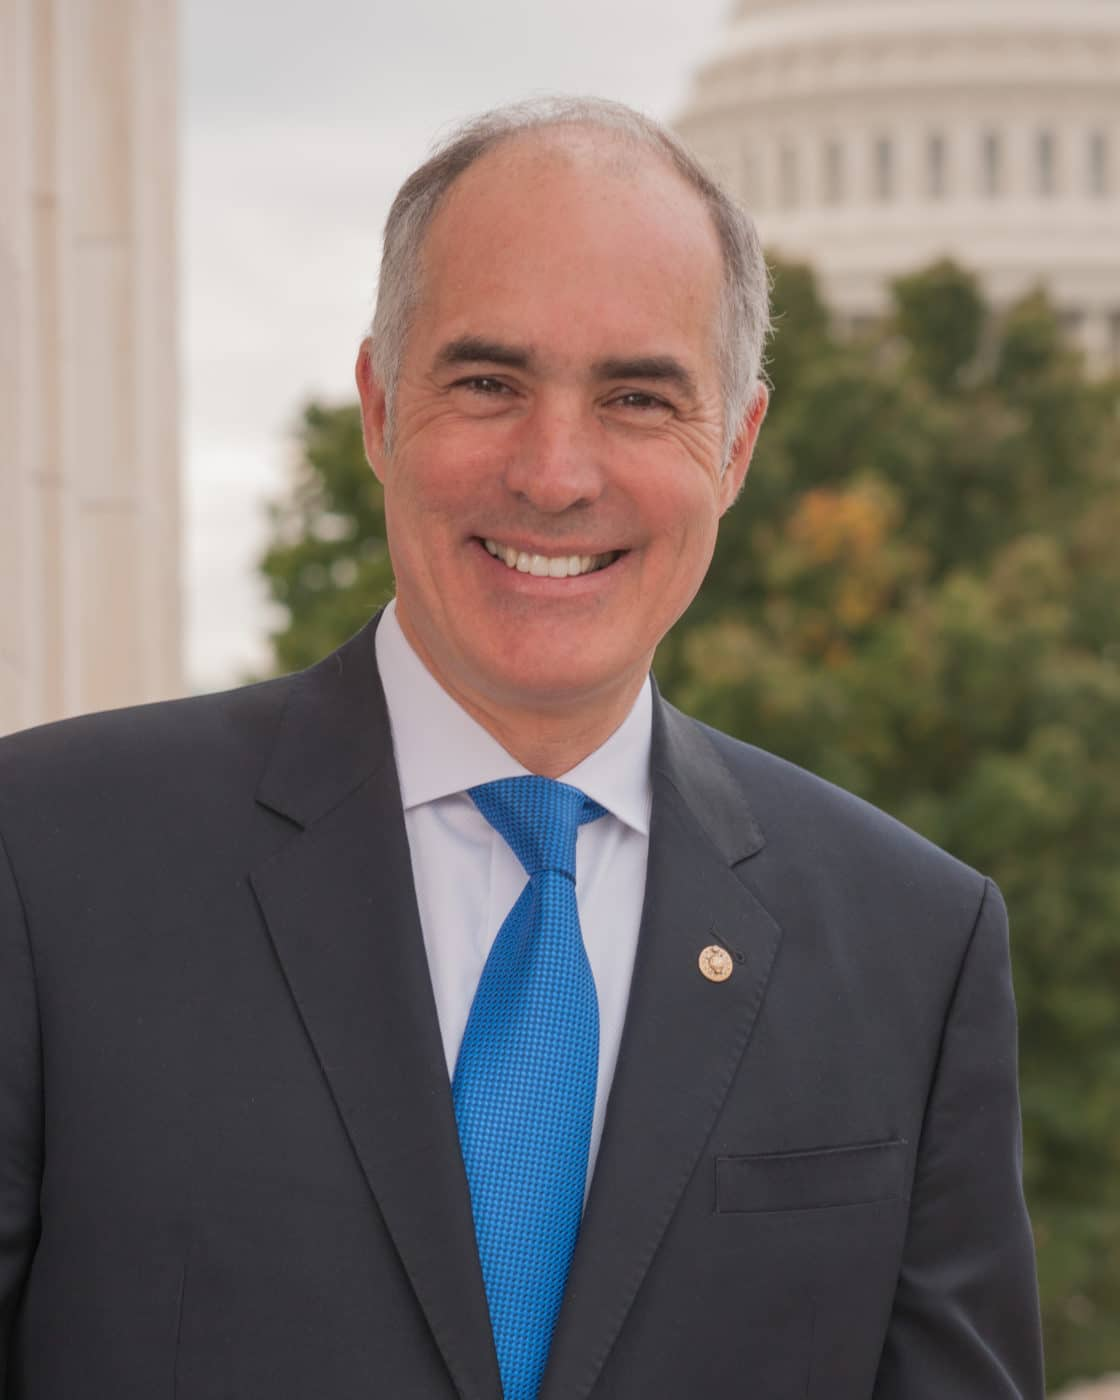 U.S. Senator Bob Casey, Jr.